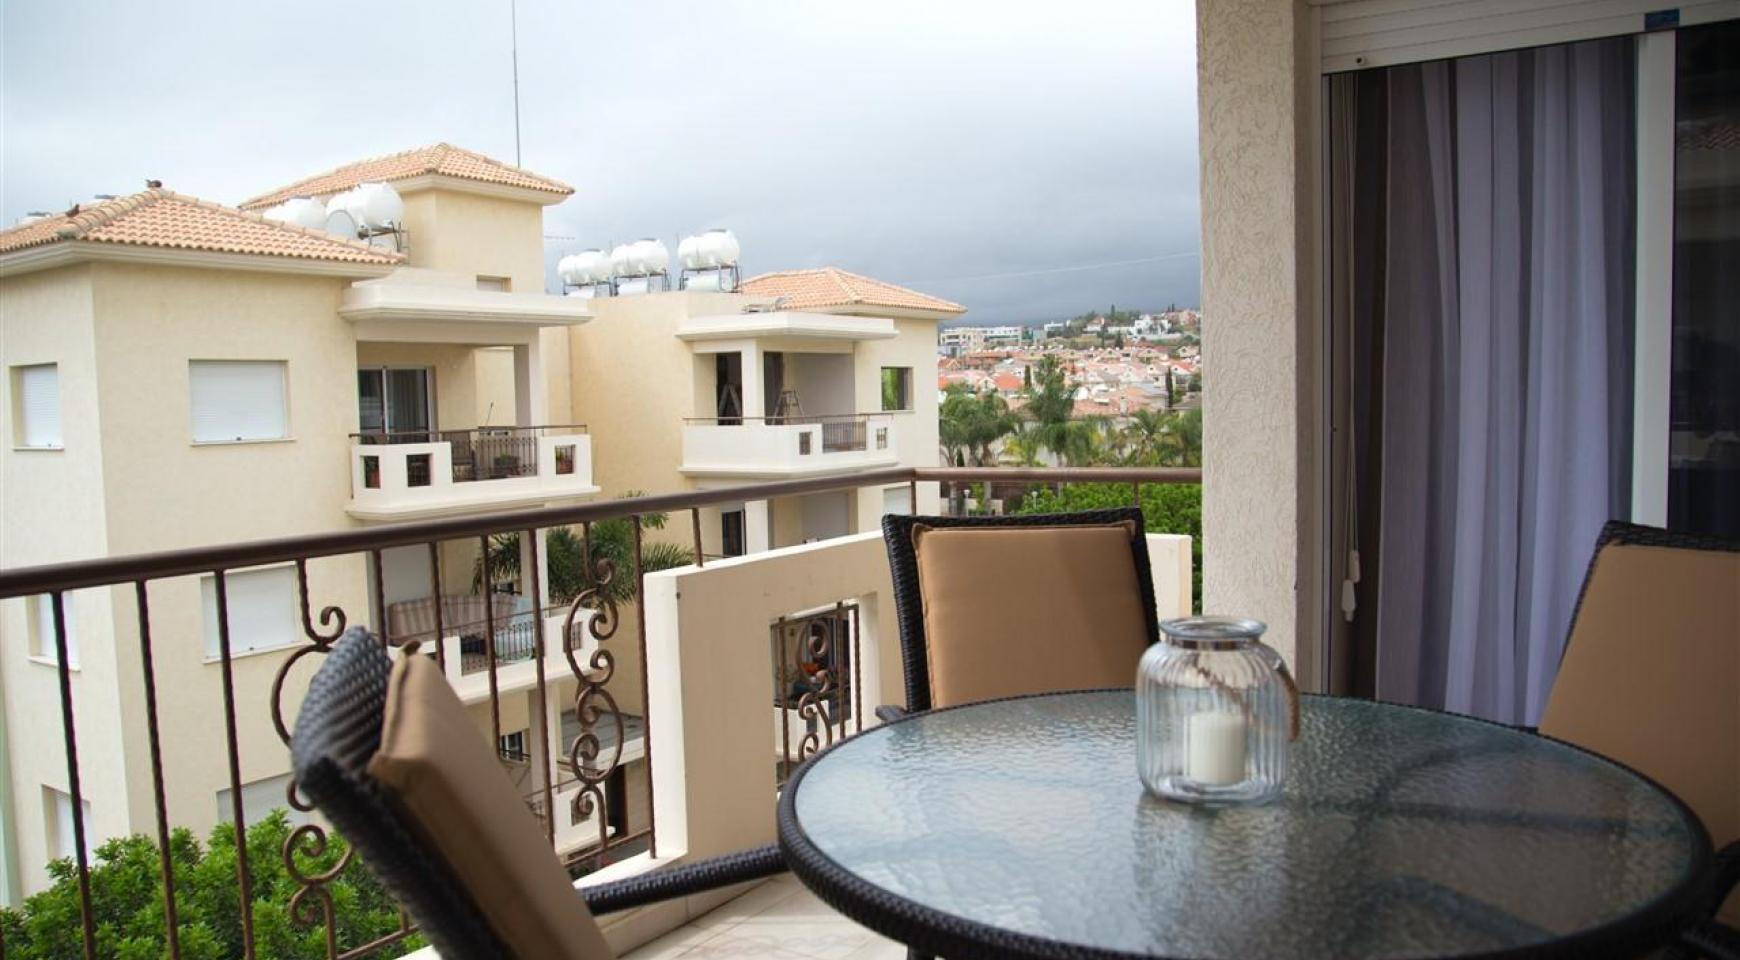 2 Bedroom Apartment Mesogios Iris 304 in the Complex near the Sea - 23